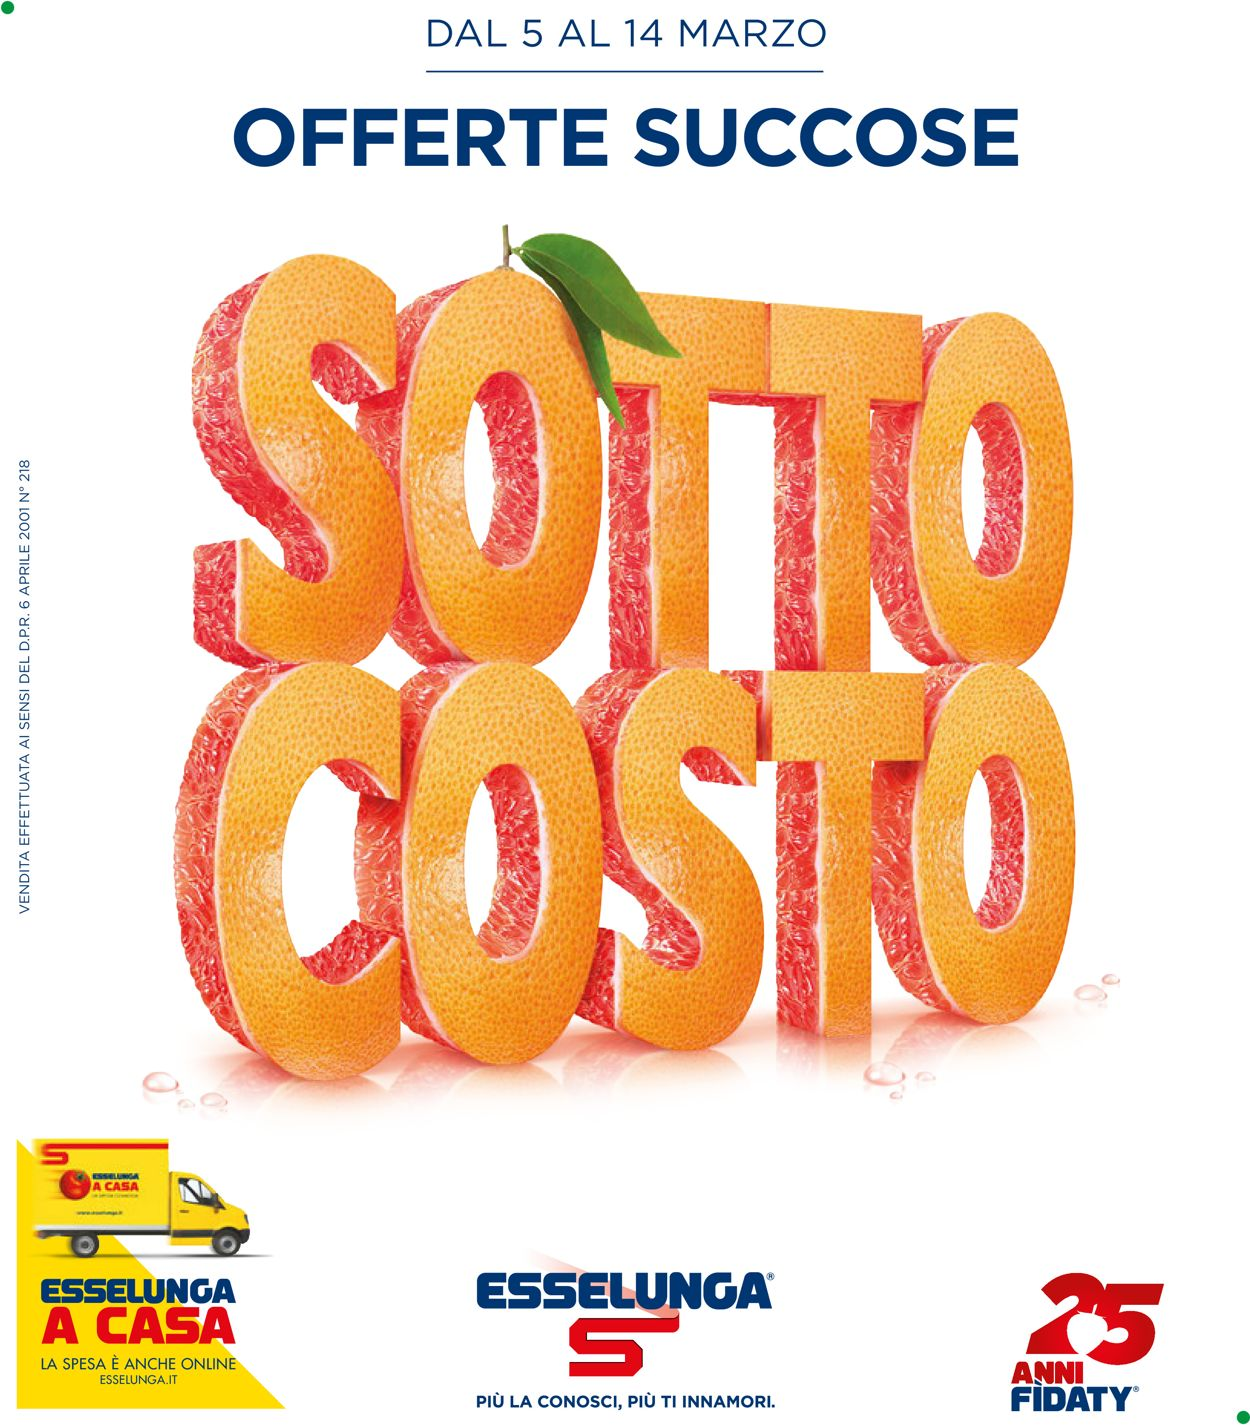 Volantino Esselunga - Offerte 05/03-14/03/2020